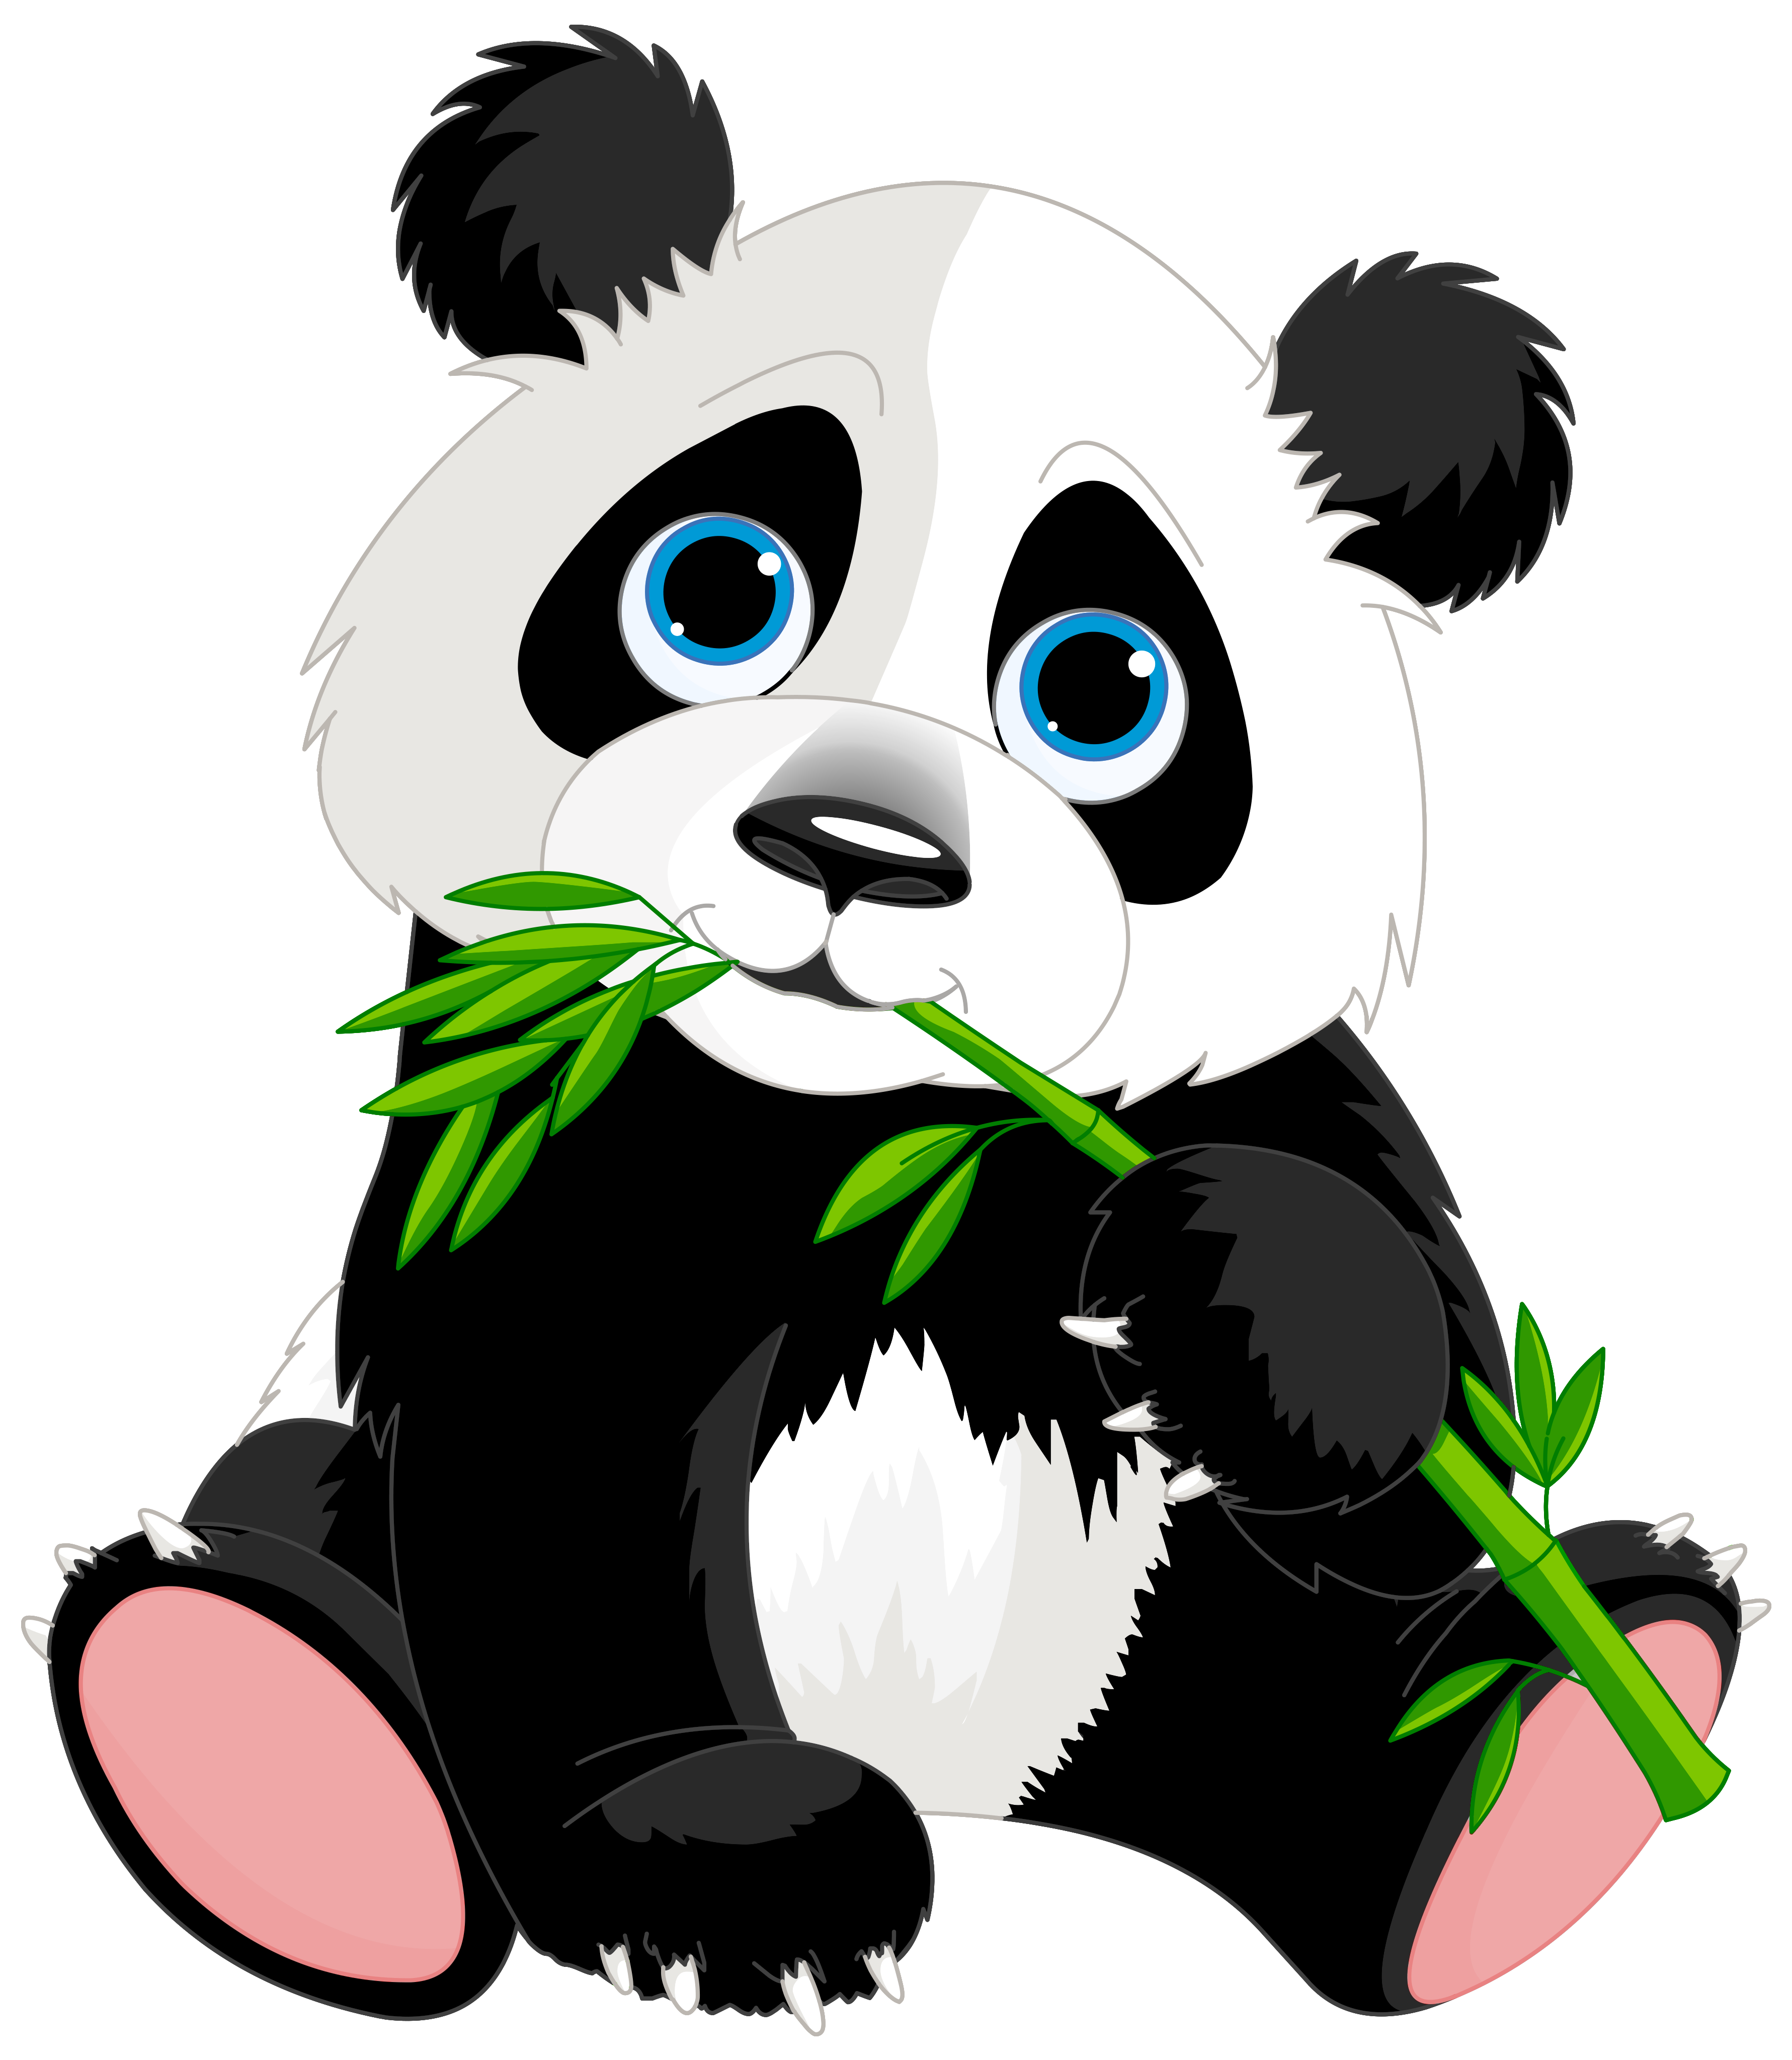 3562x4094 Cute Panda Cartoon Png Clipart Imageu200b Gallery Yopriceville